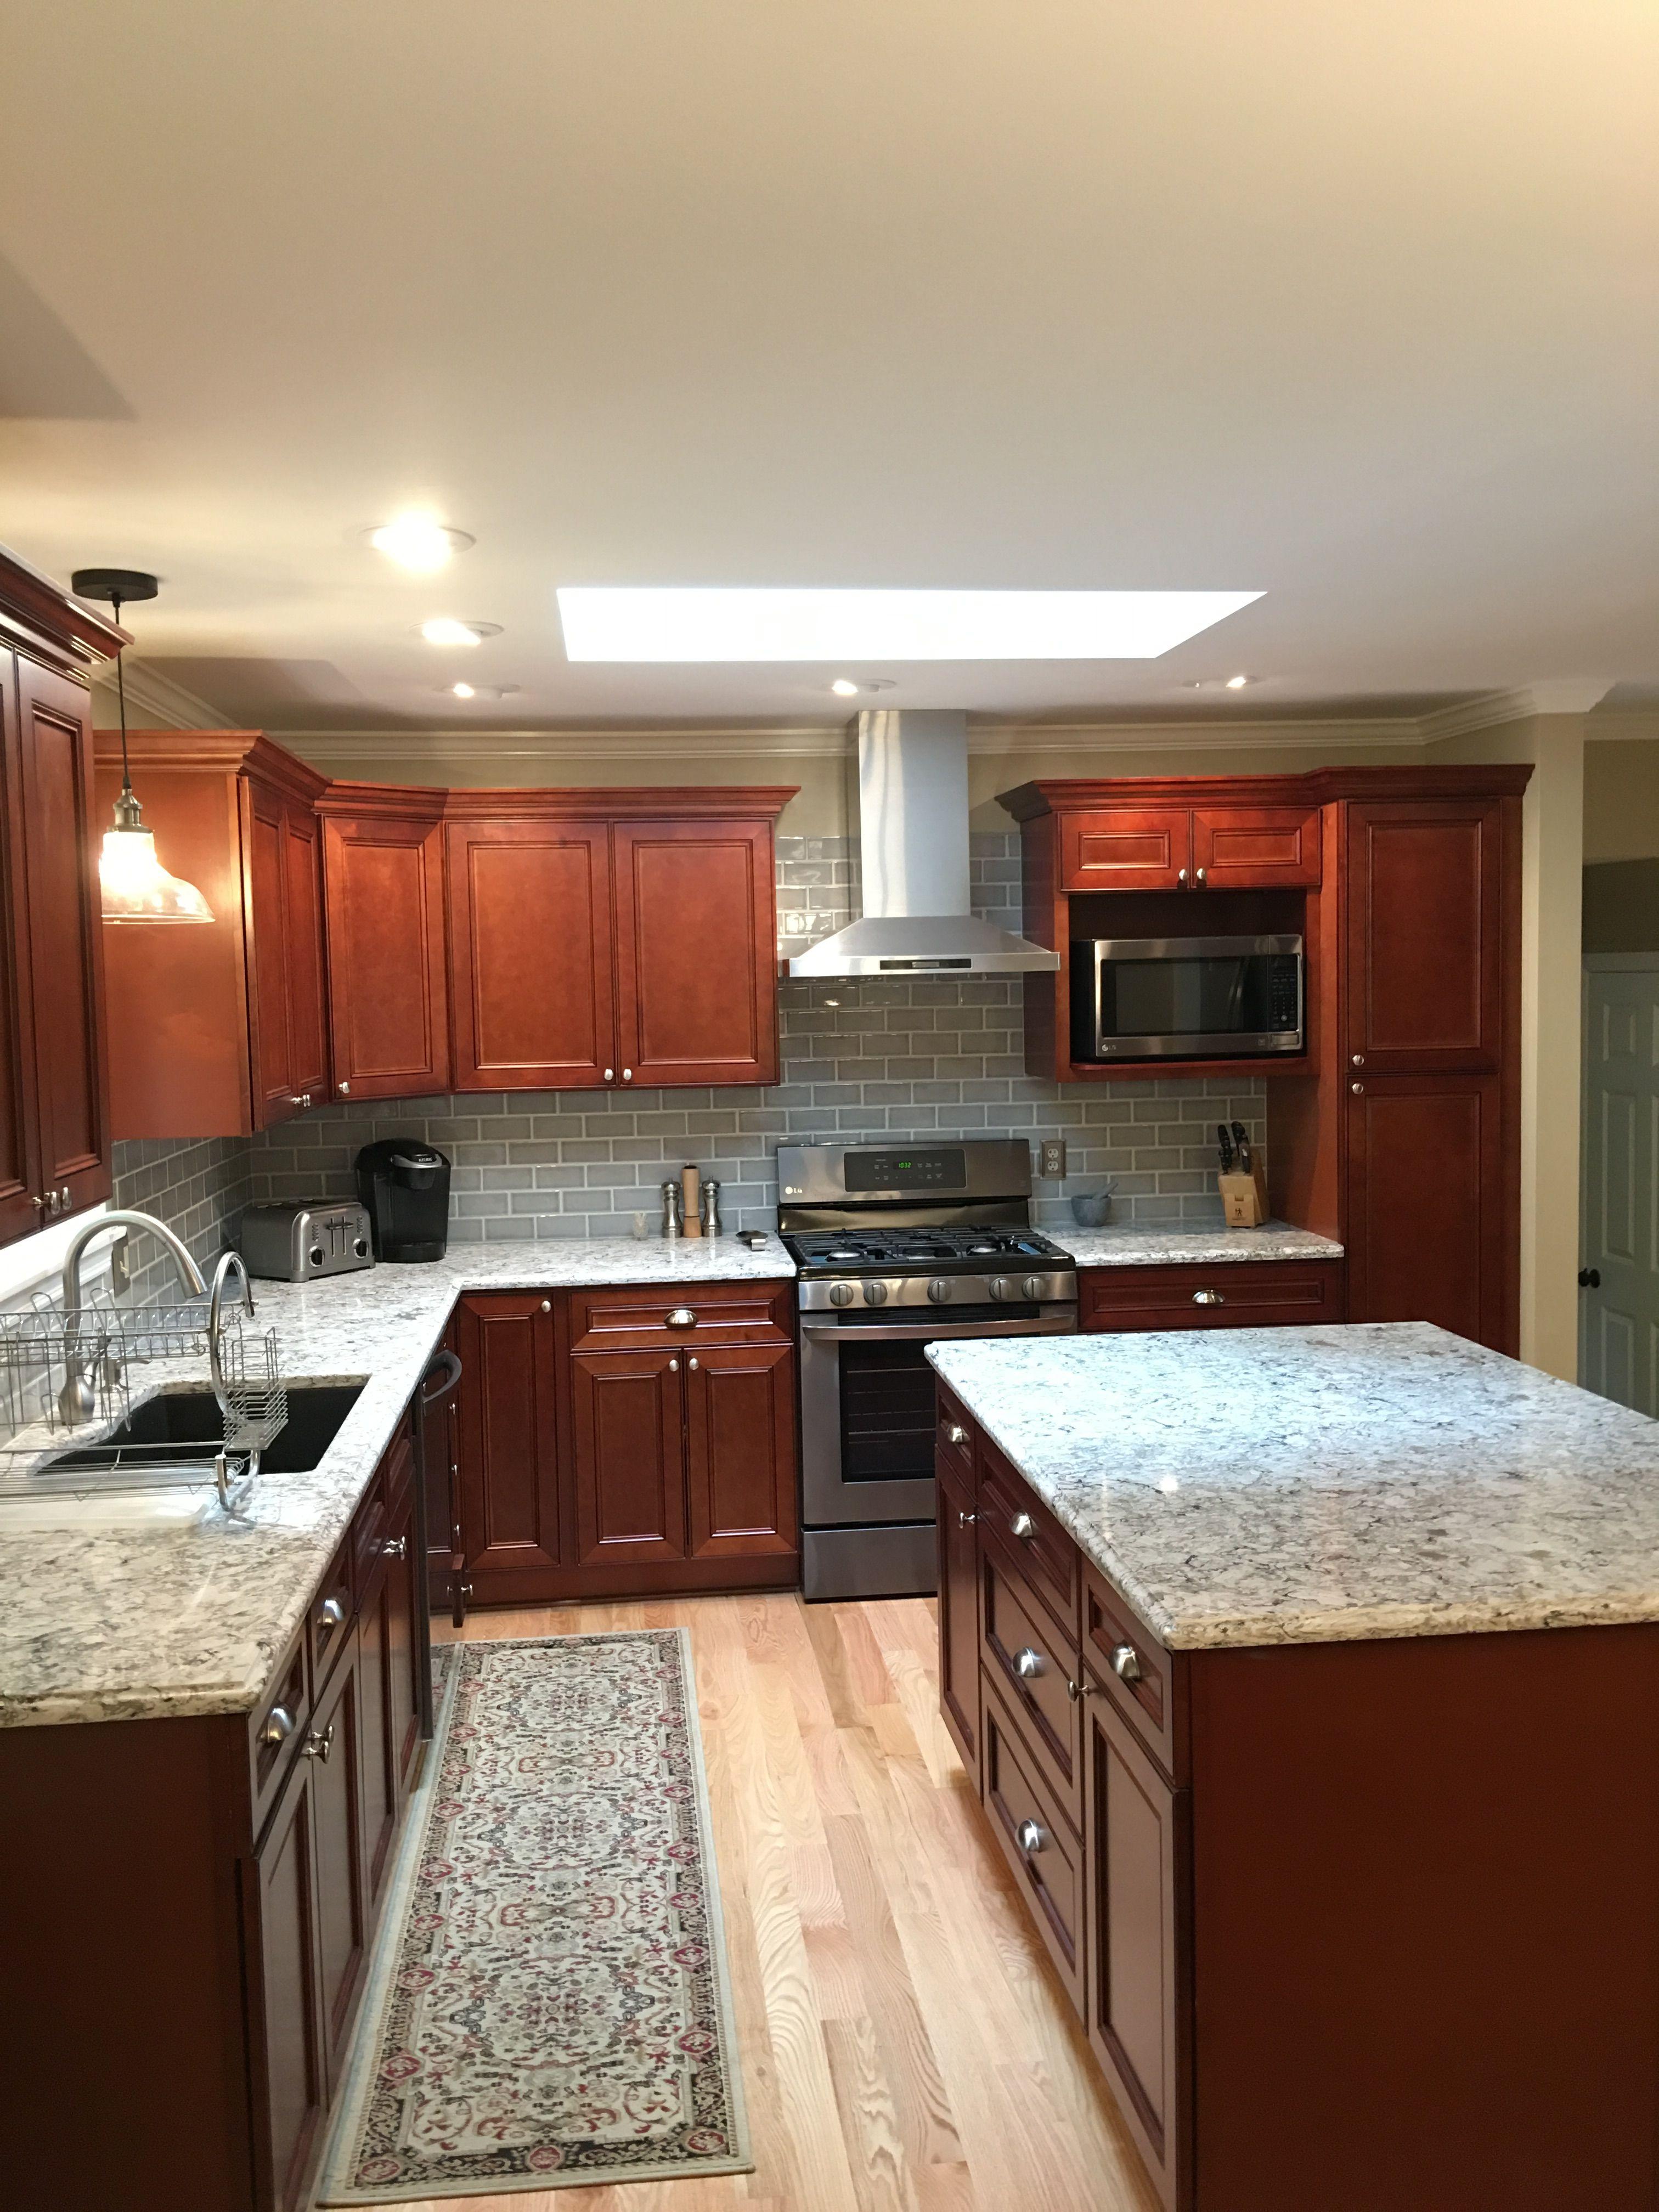 Cherry Cabinets With Quartz Countertops